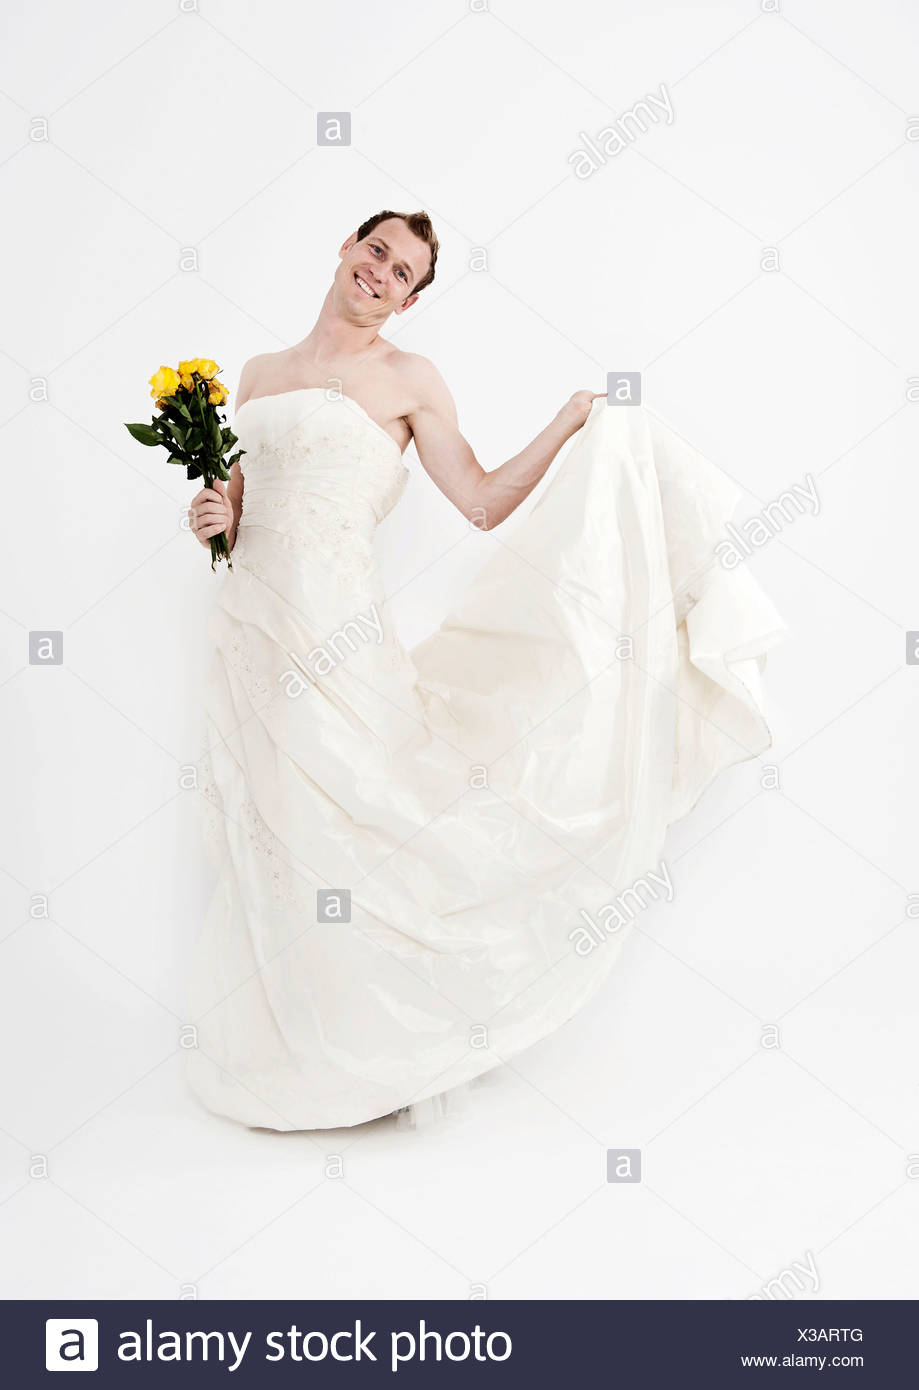 Charmant Brautkleid Lexington Ky Ideen - Brautkleider Ideen ...